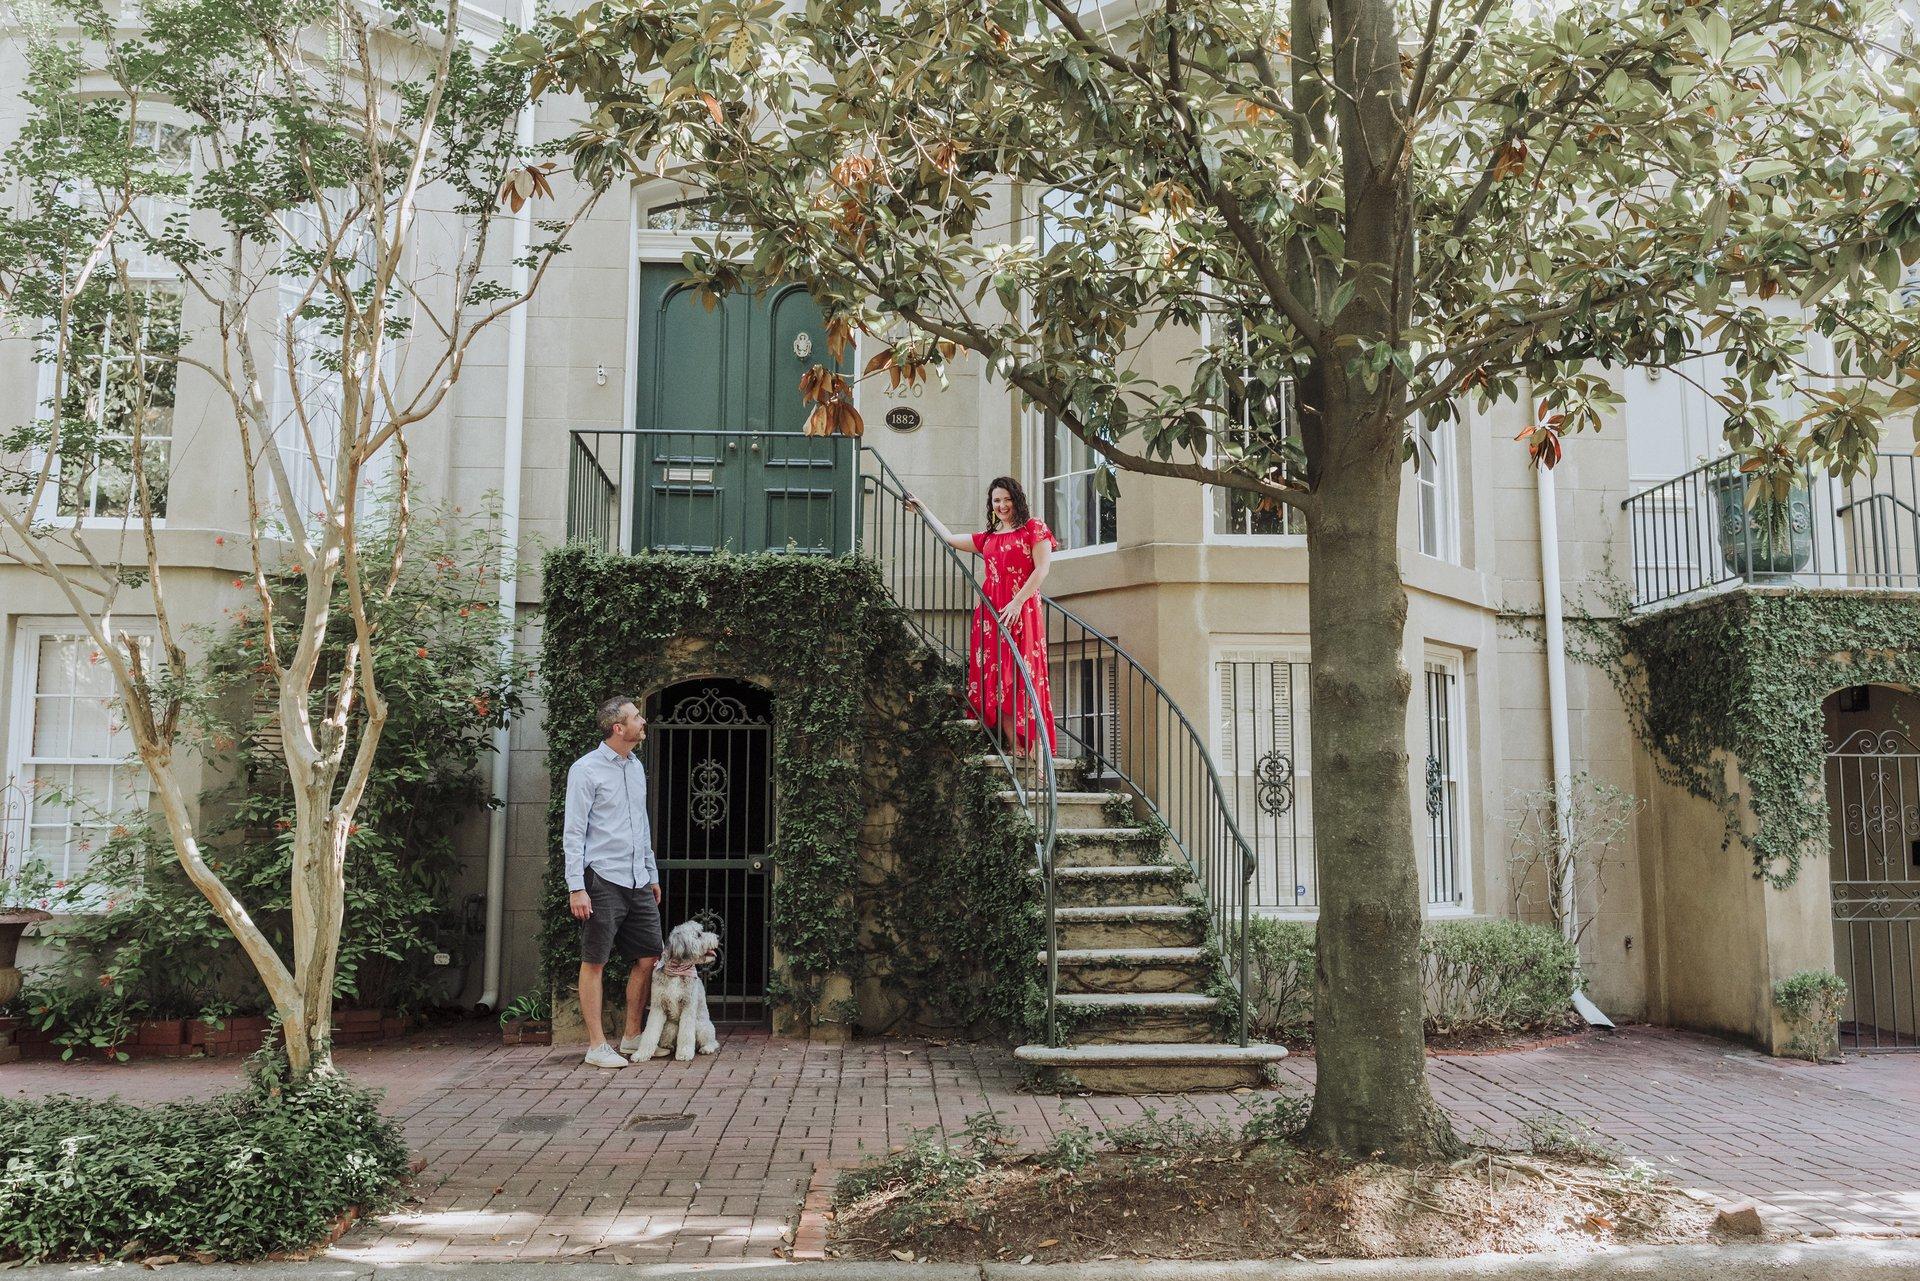 Savannah-United States-travel-story-Flytographer-30